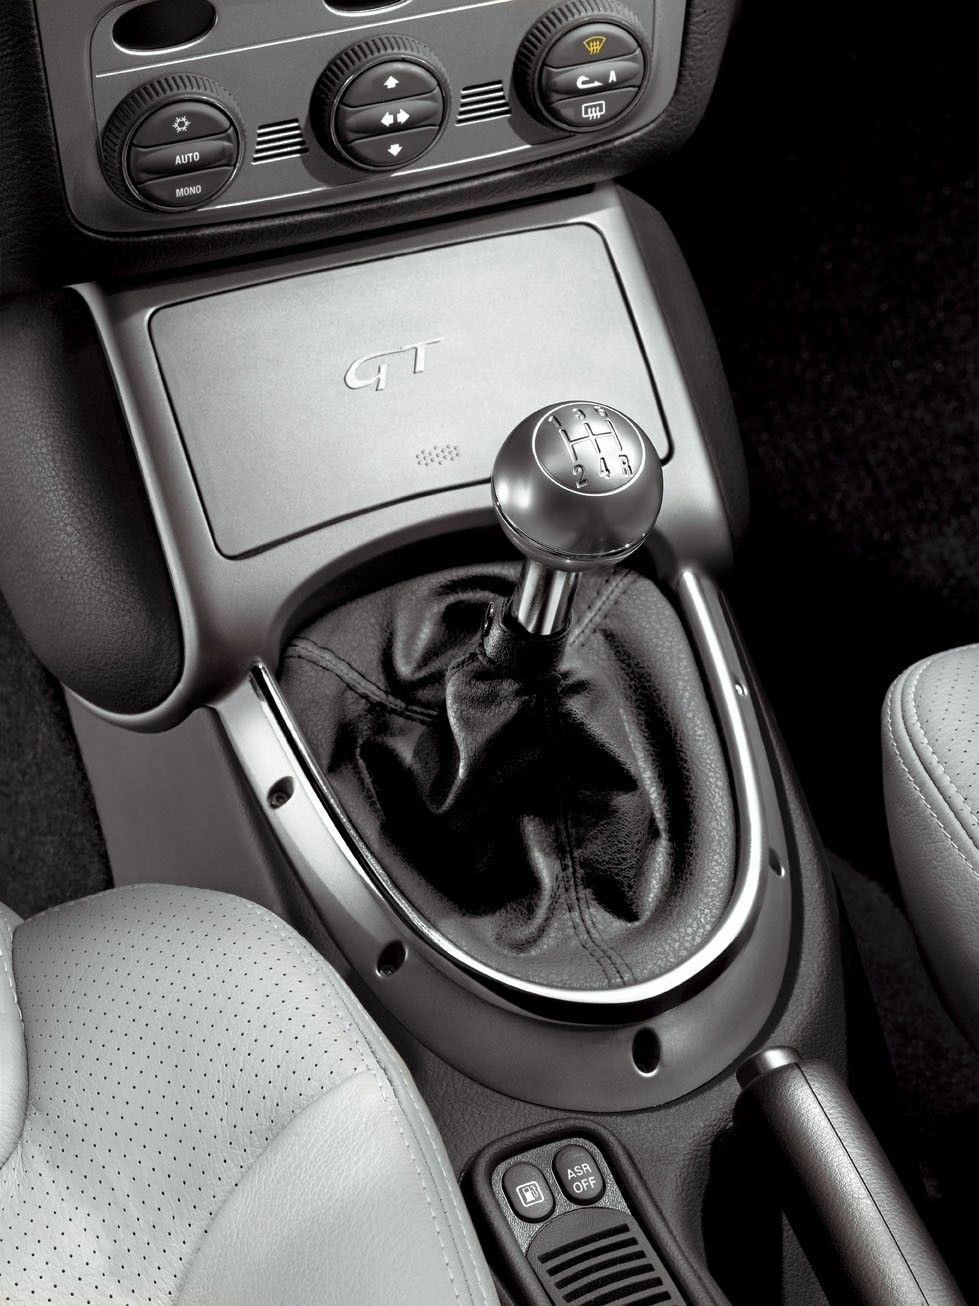 Alfa Romeo Gt Aluminium Interior Dashboard Gear Trim Kit New Genuine 50903041 Ebay